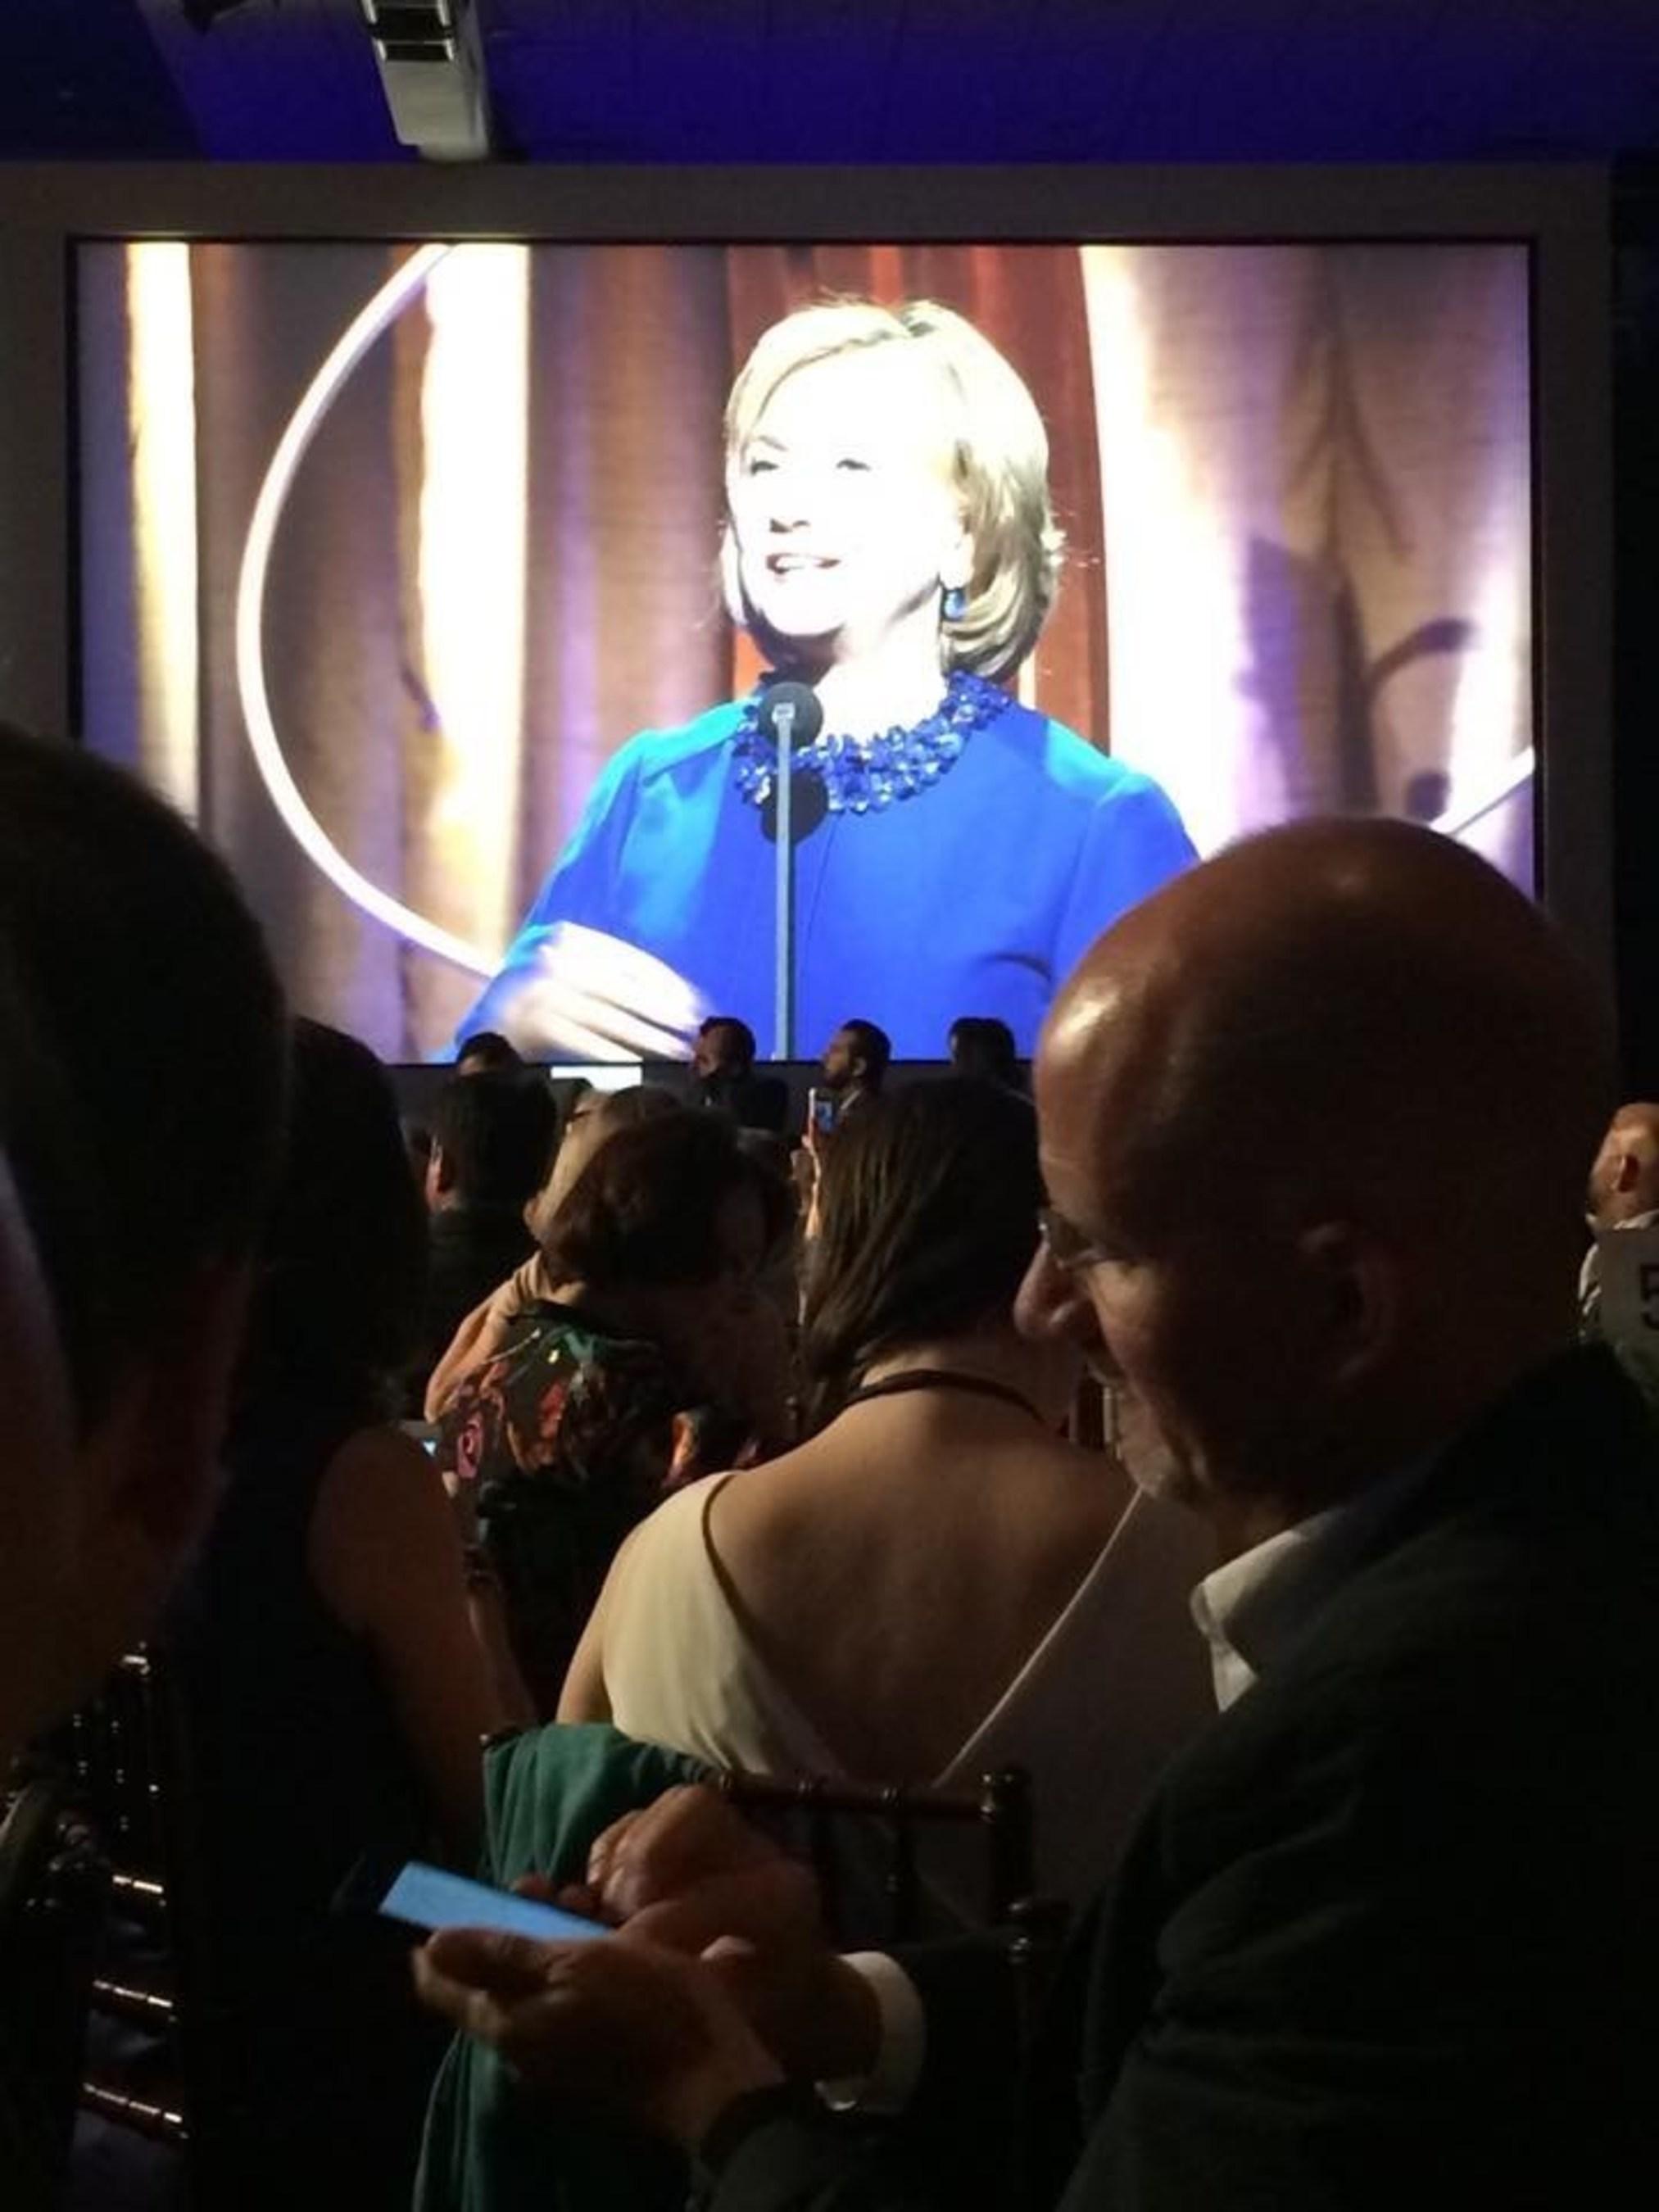 Arthur Wylie ( entrepreneur, film producer, philanthropist) and Hillary Clinton